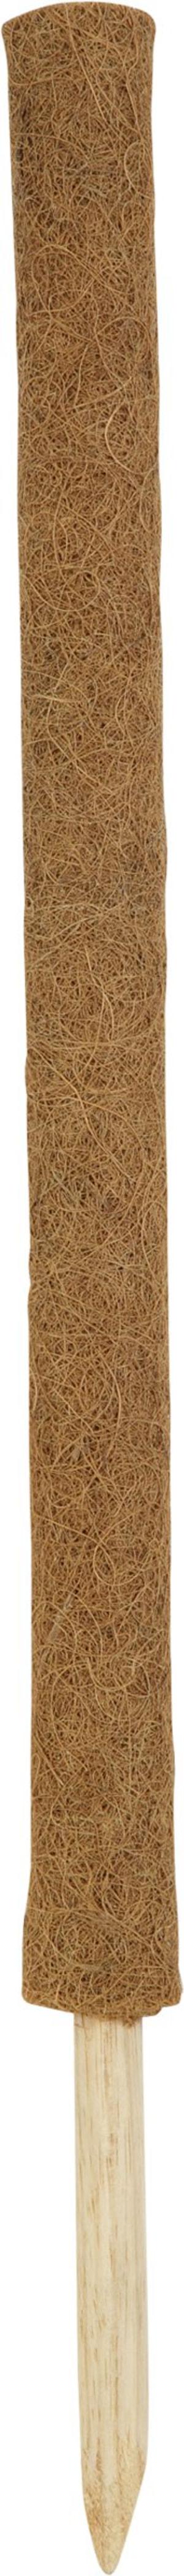 Kokos-Pflanzenstab